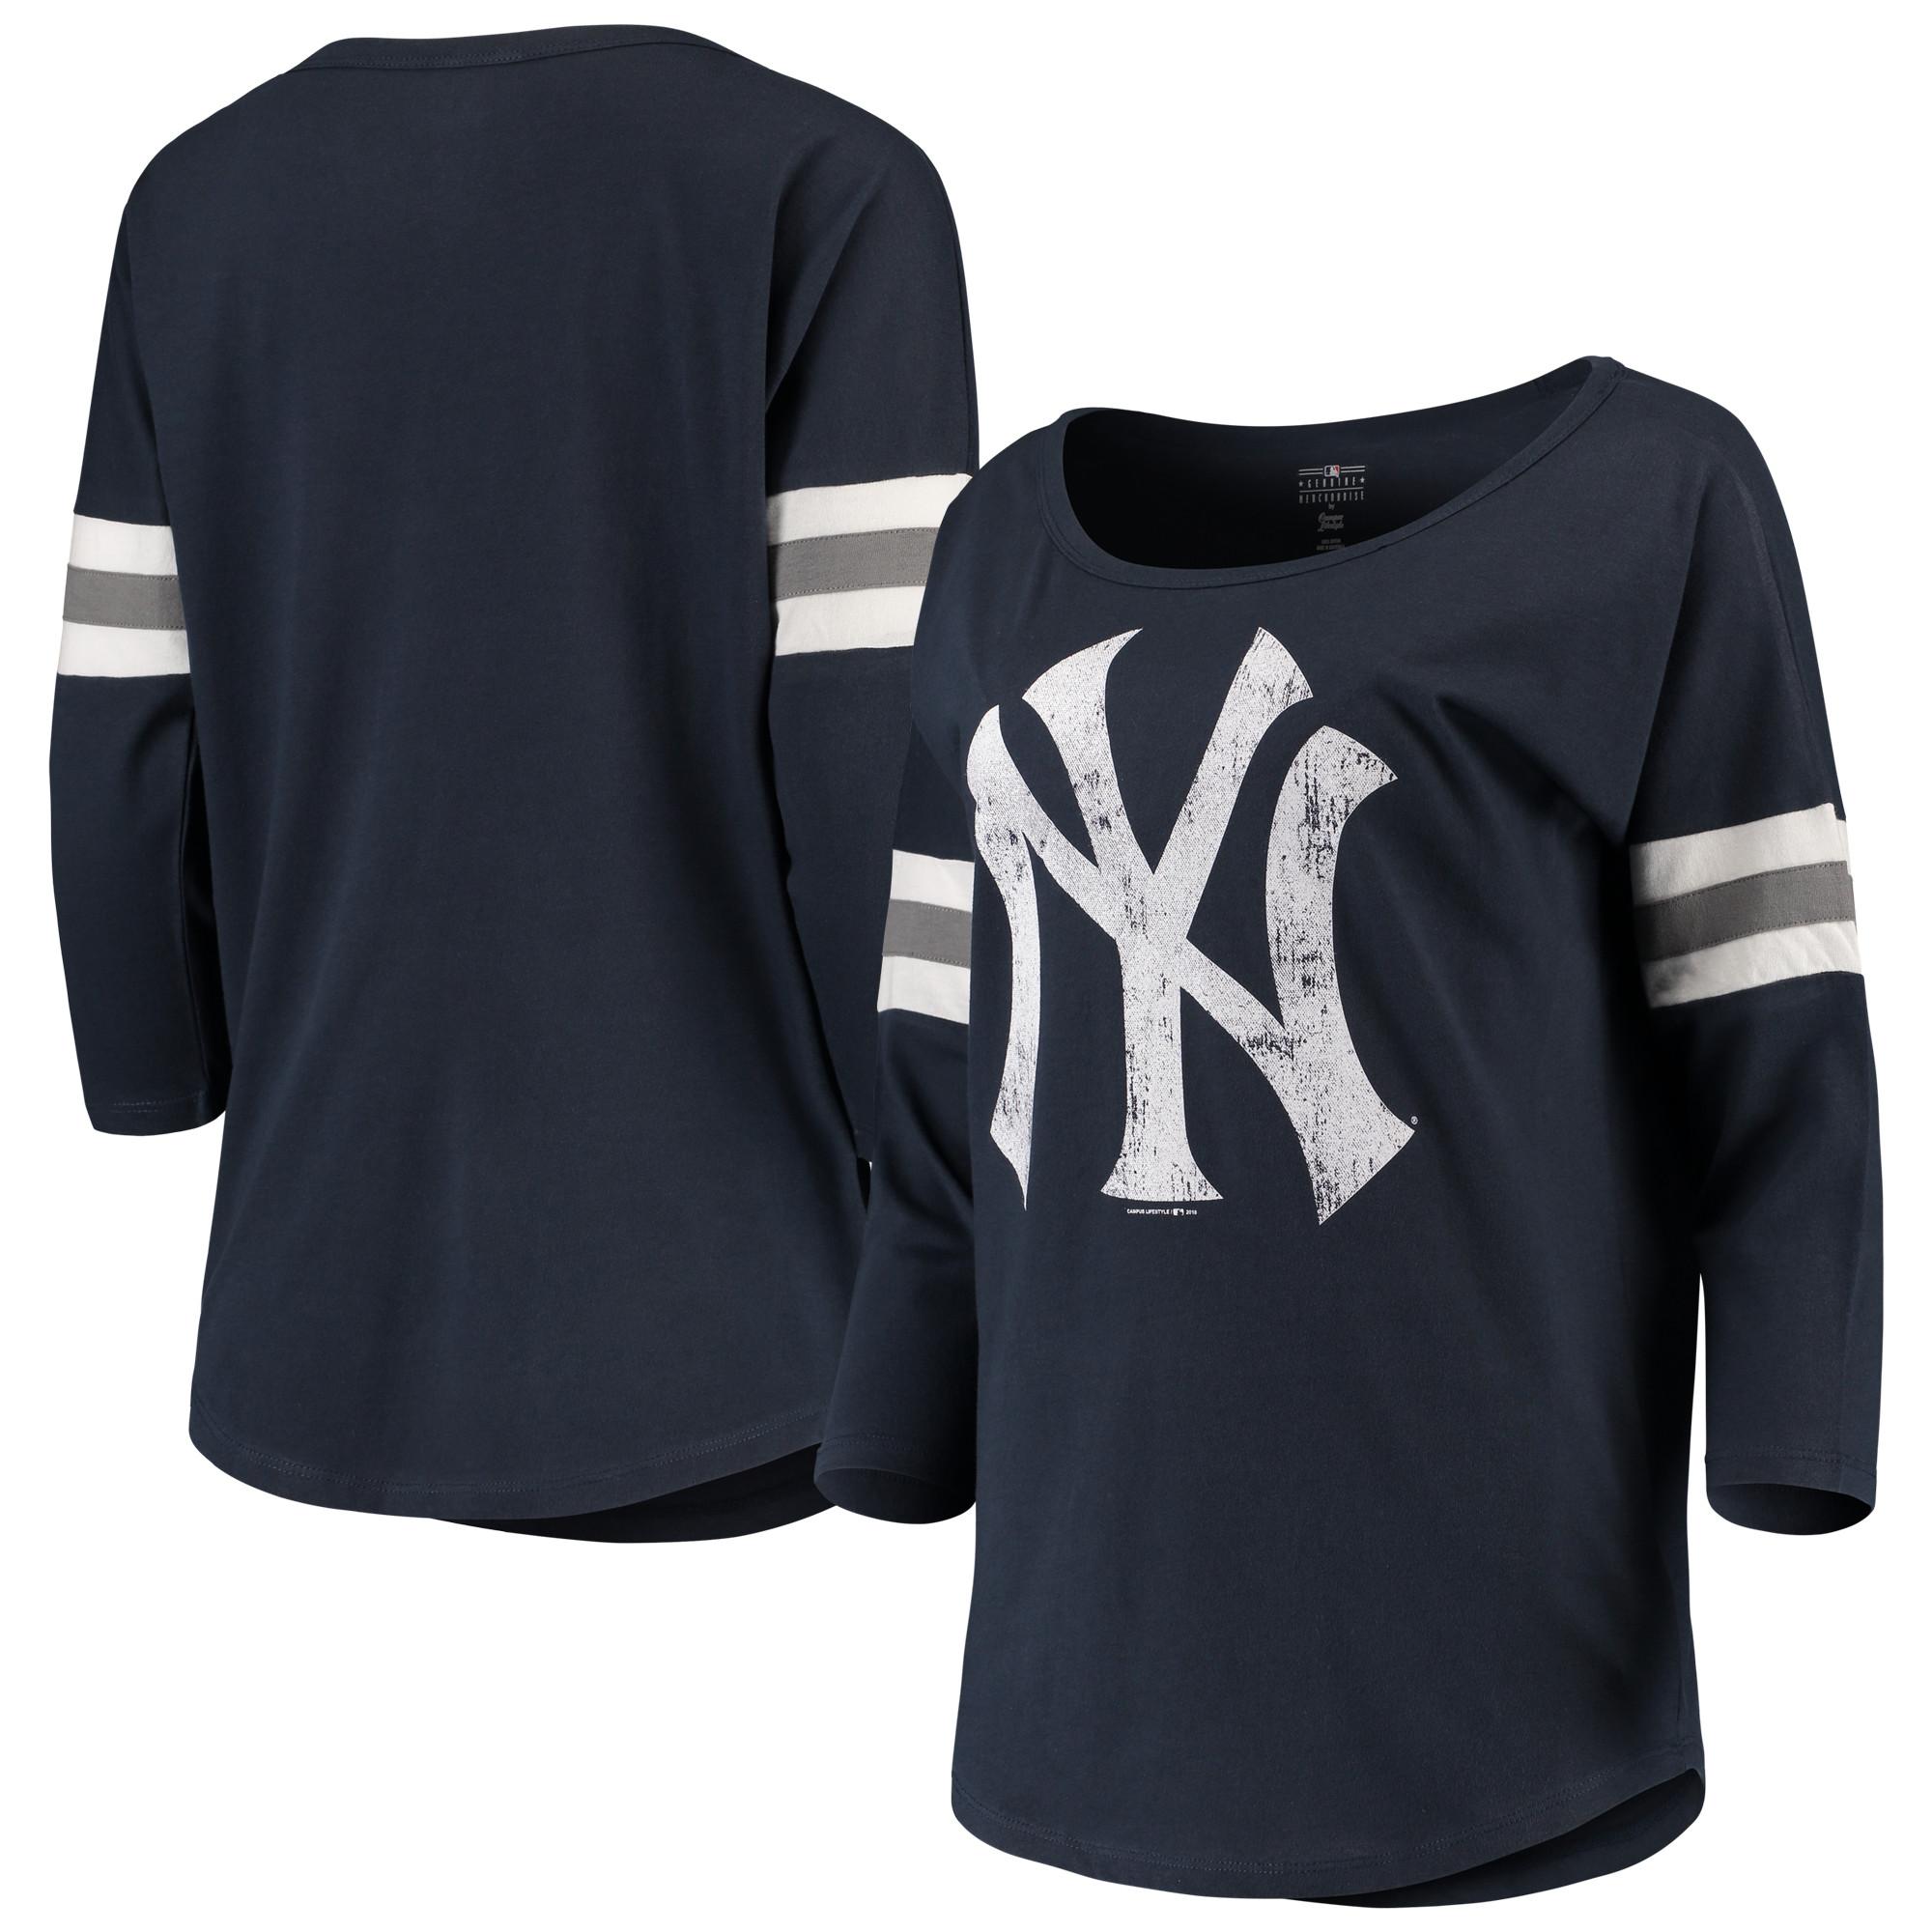 Women's New Era Navy New York Yankees Scoop Neck 3/4-Sleeve T-Shirt